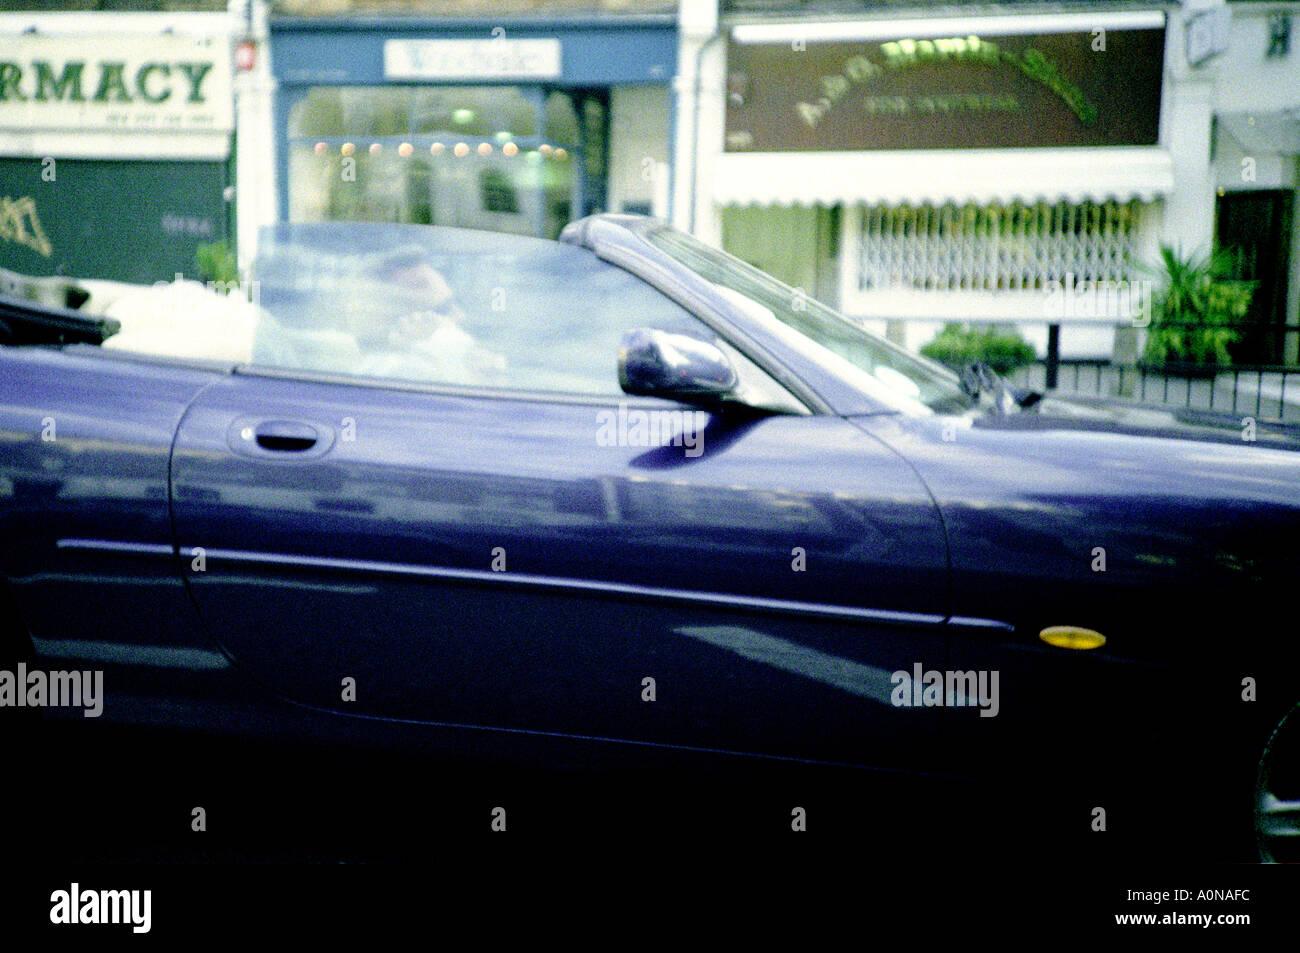 Smooth geezer in posh car - Stock Image